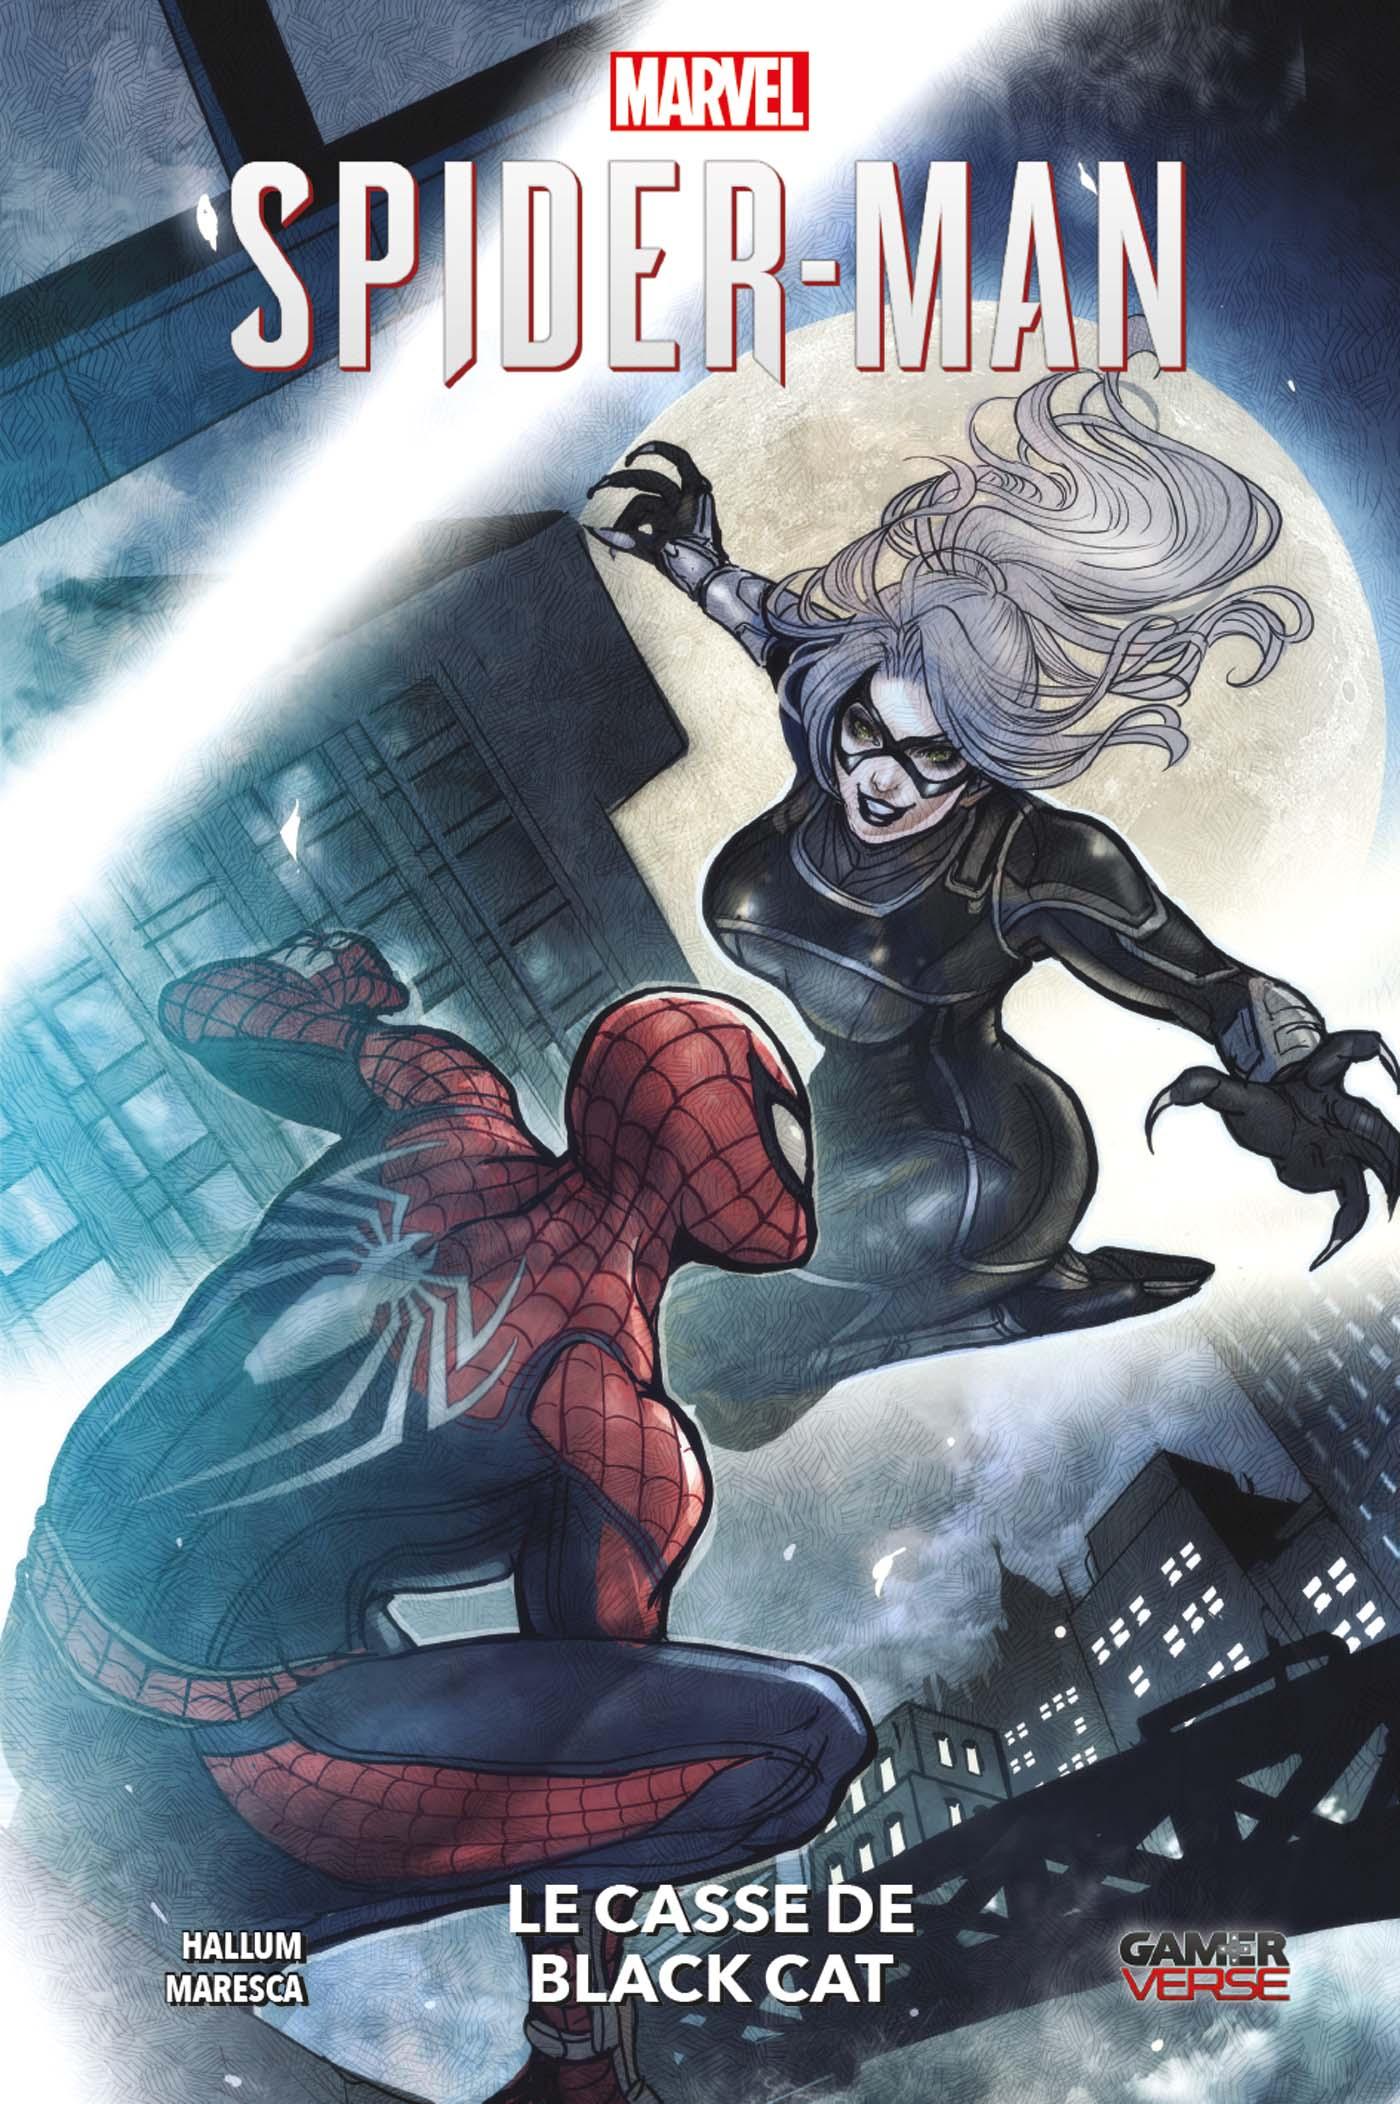 Spider-Man: Black Cat strikers (Gamer Verse) (VF)